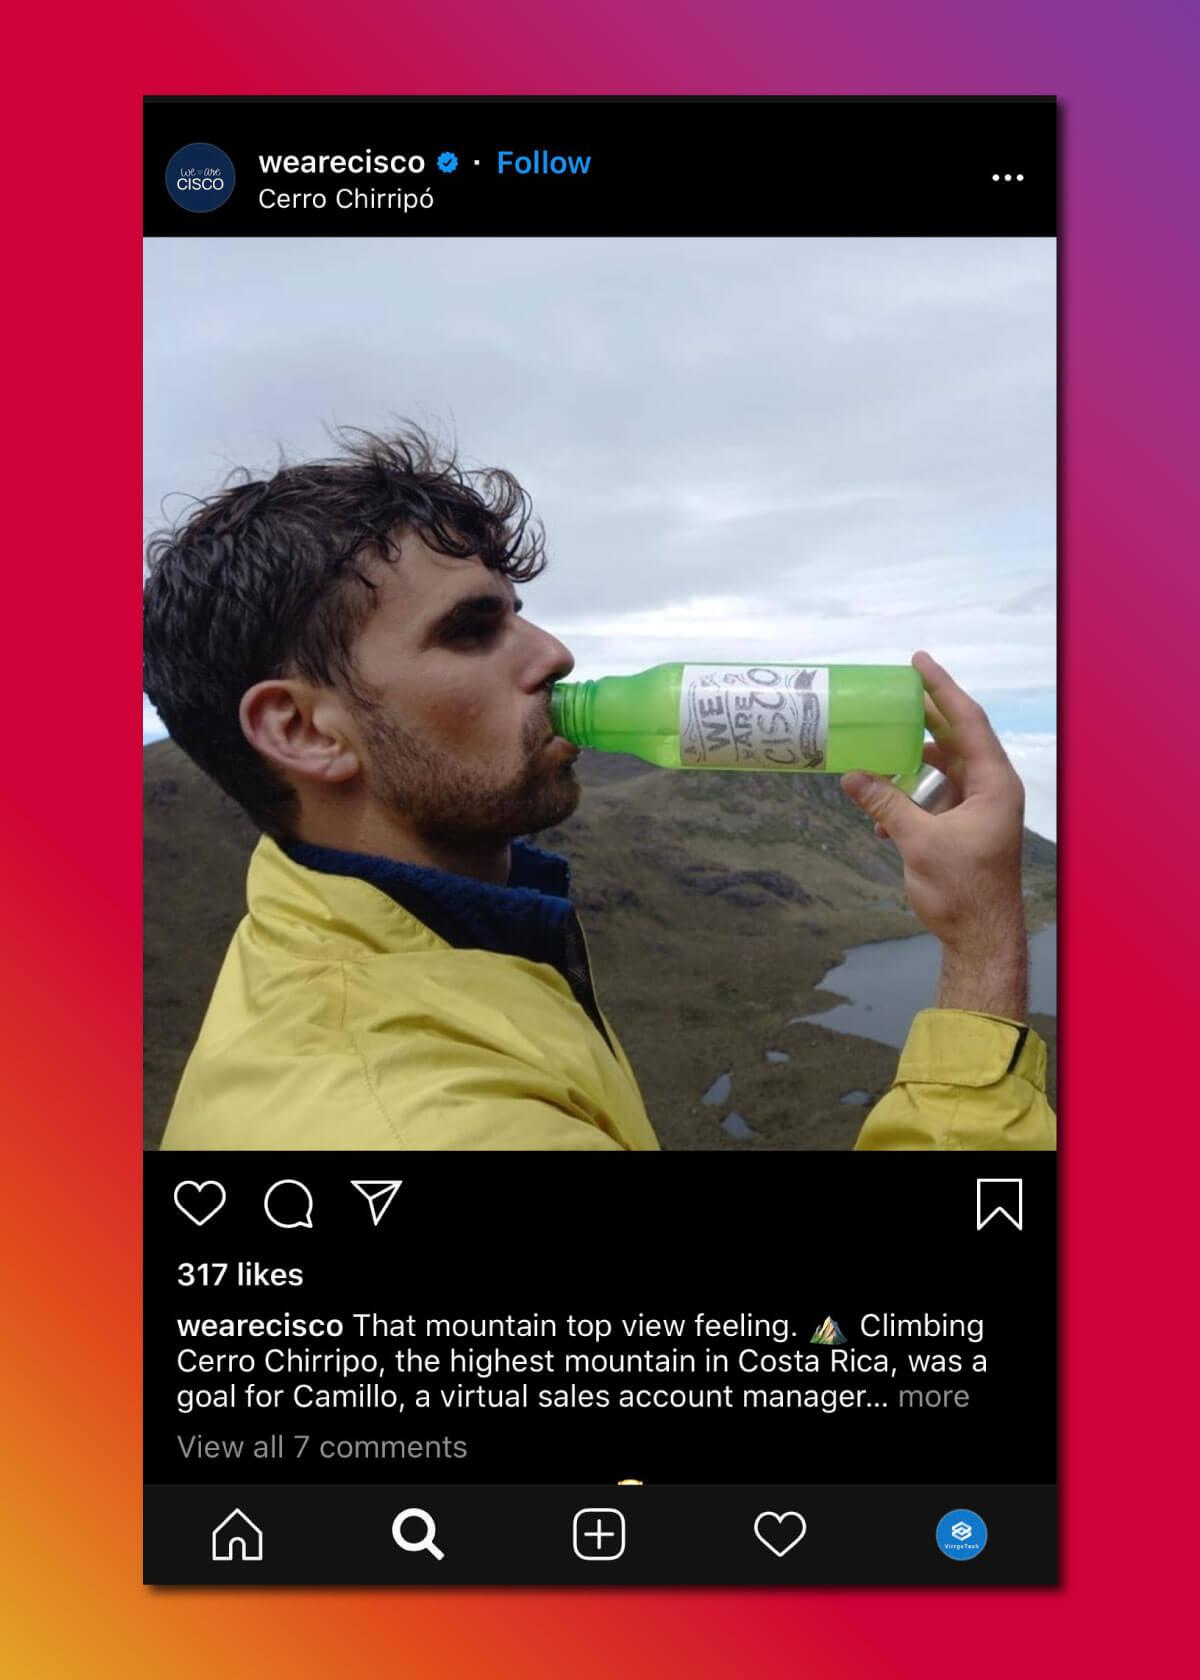 Instagram Marketing Strategy - Promotional Posts